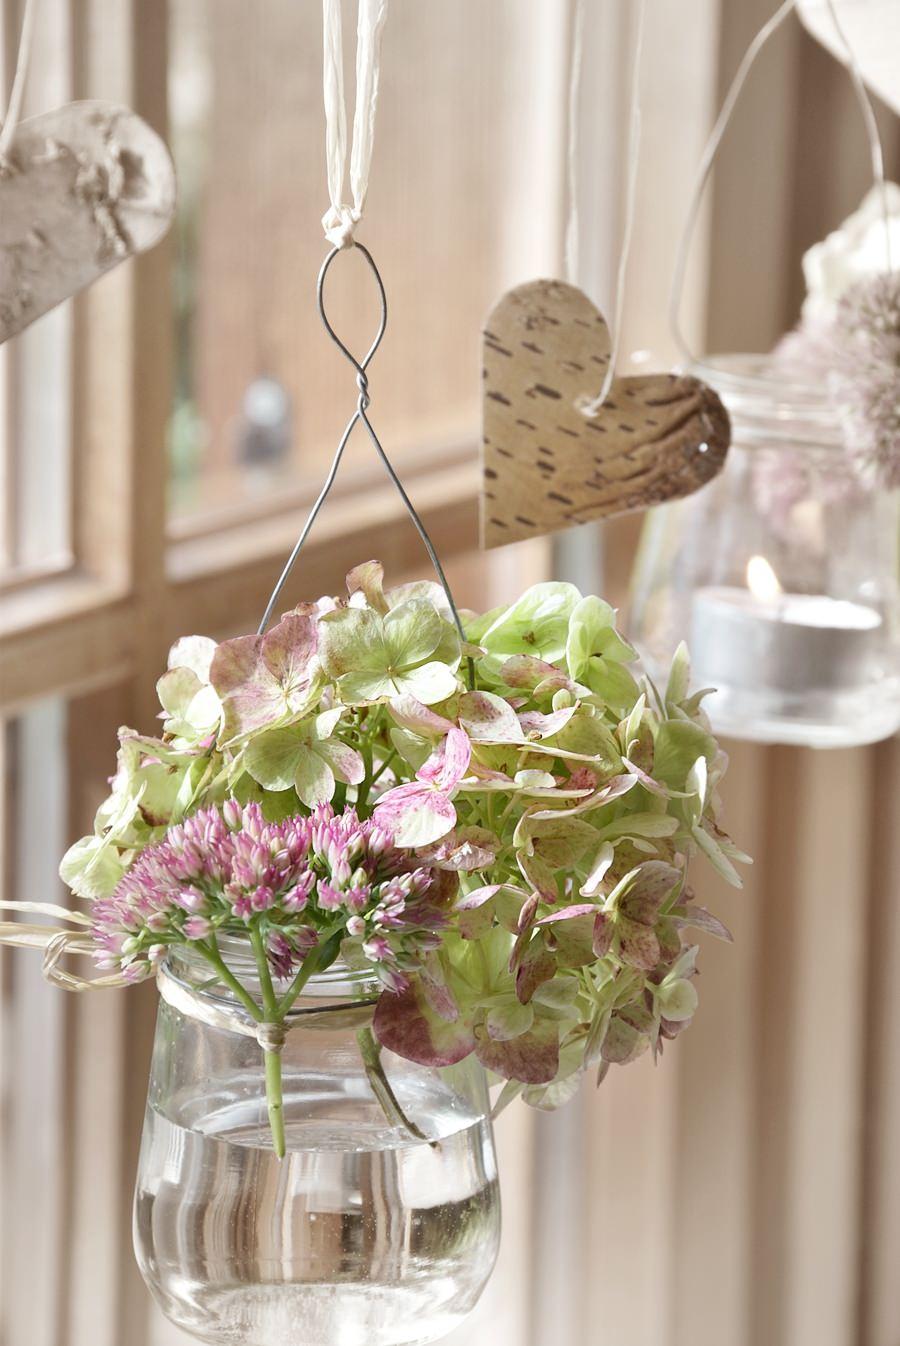 Fensterdeko - Blumen in Glas